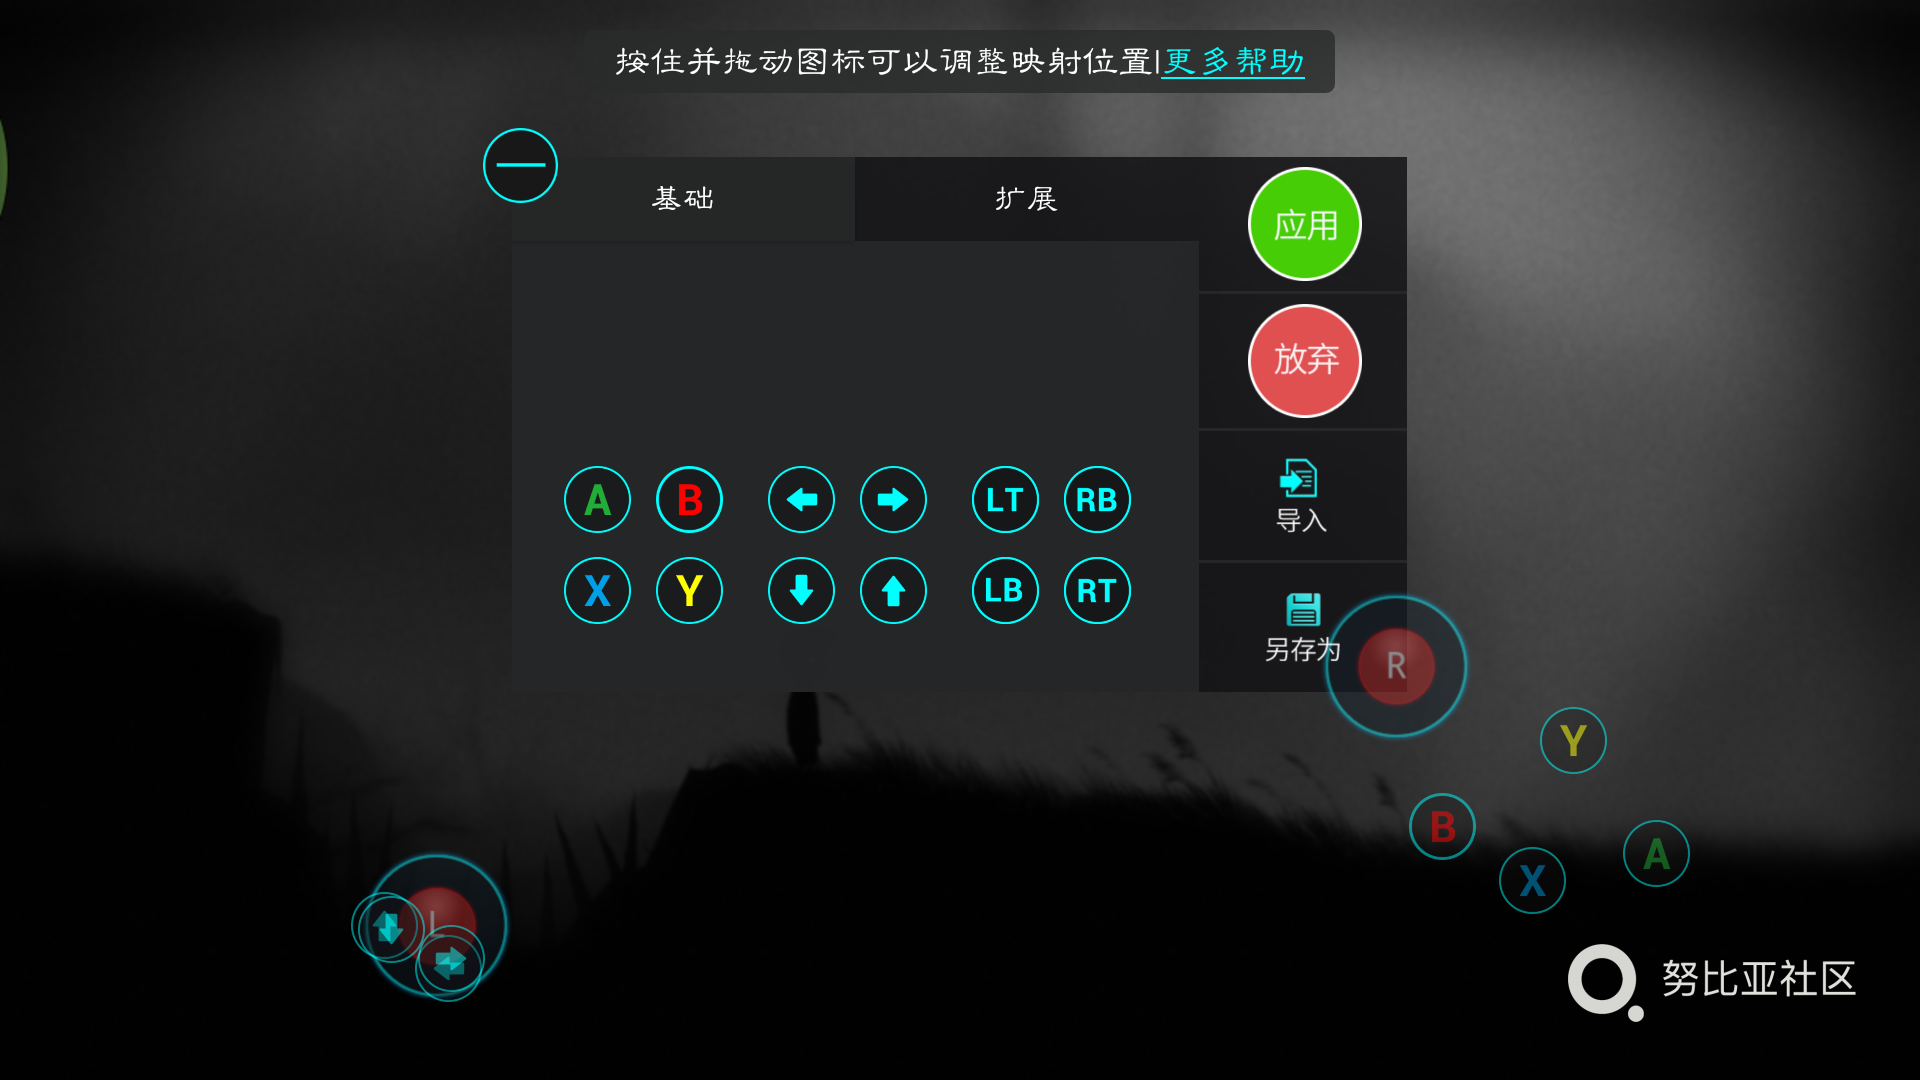 Screenshot_2018-06-18-18-43-15-665_com.playdead.limbo.full.png